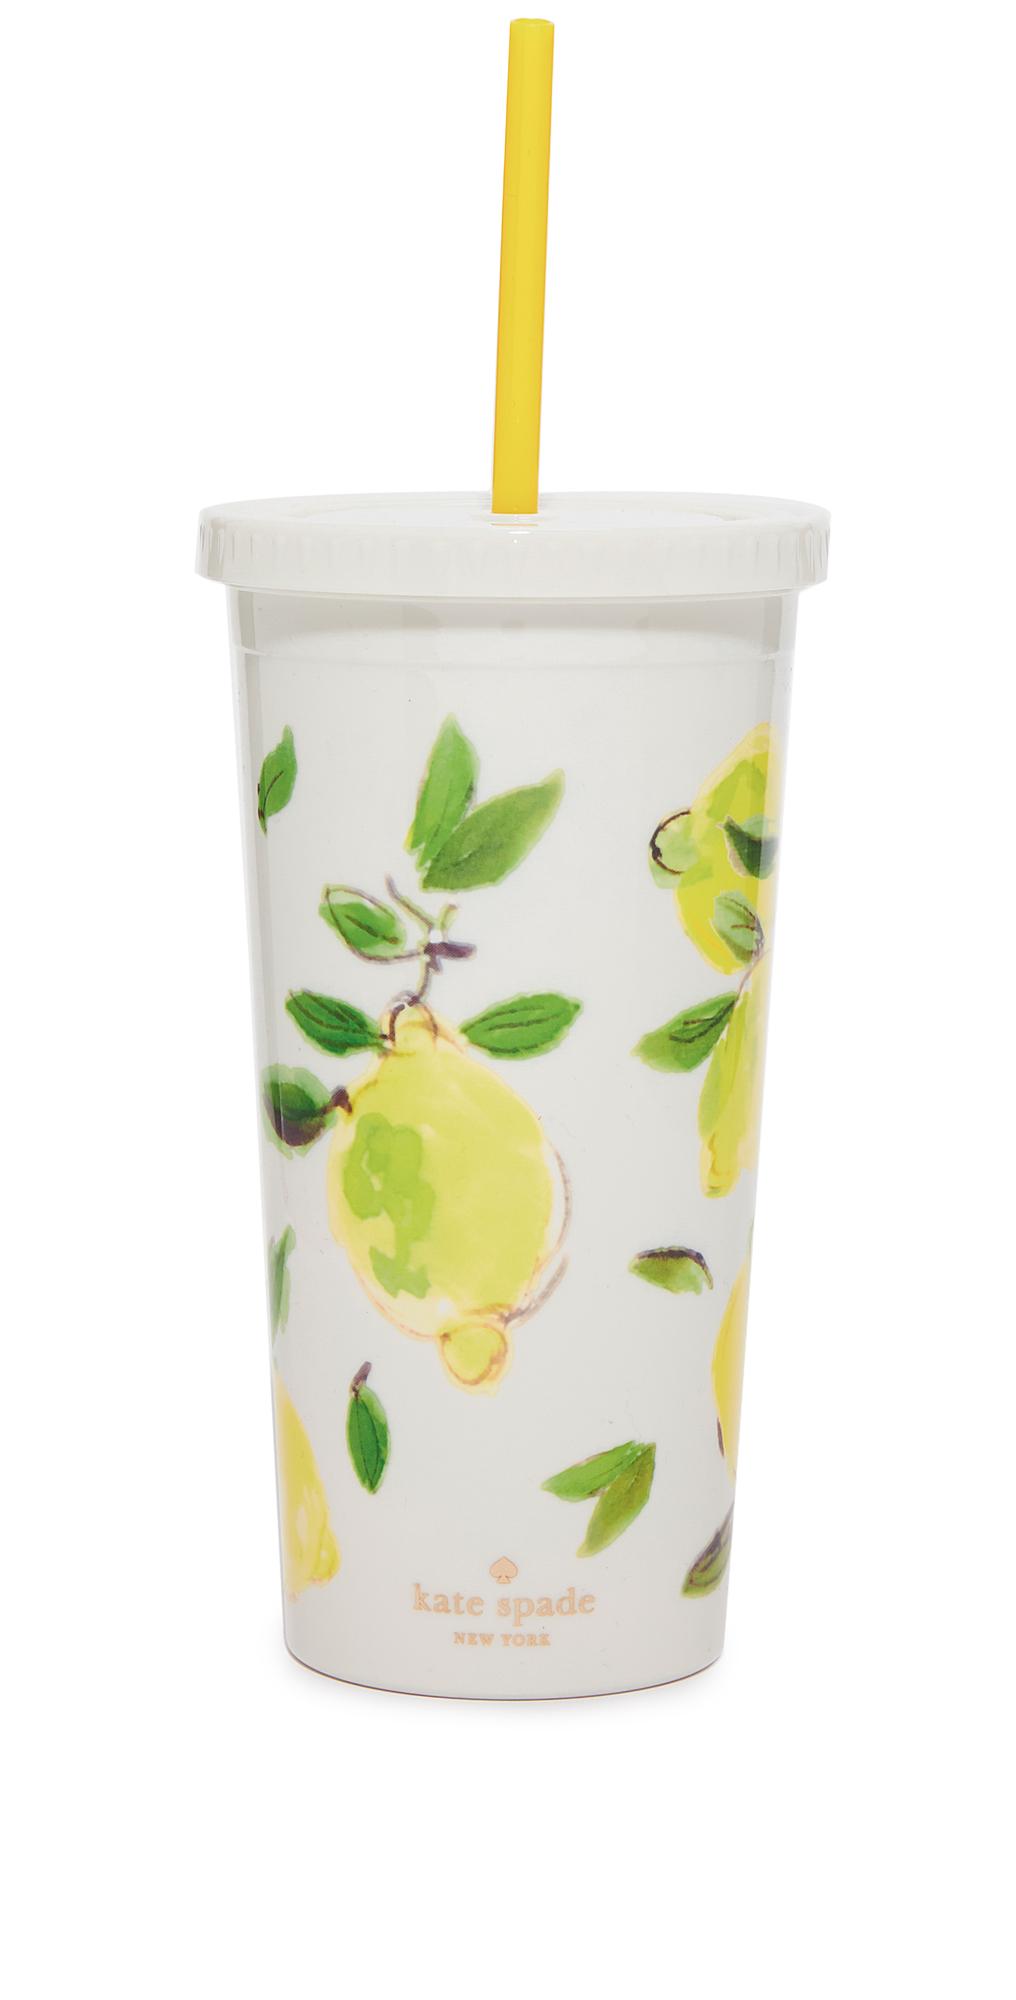 Lemon Tumbler with Straw Kate Spade New York